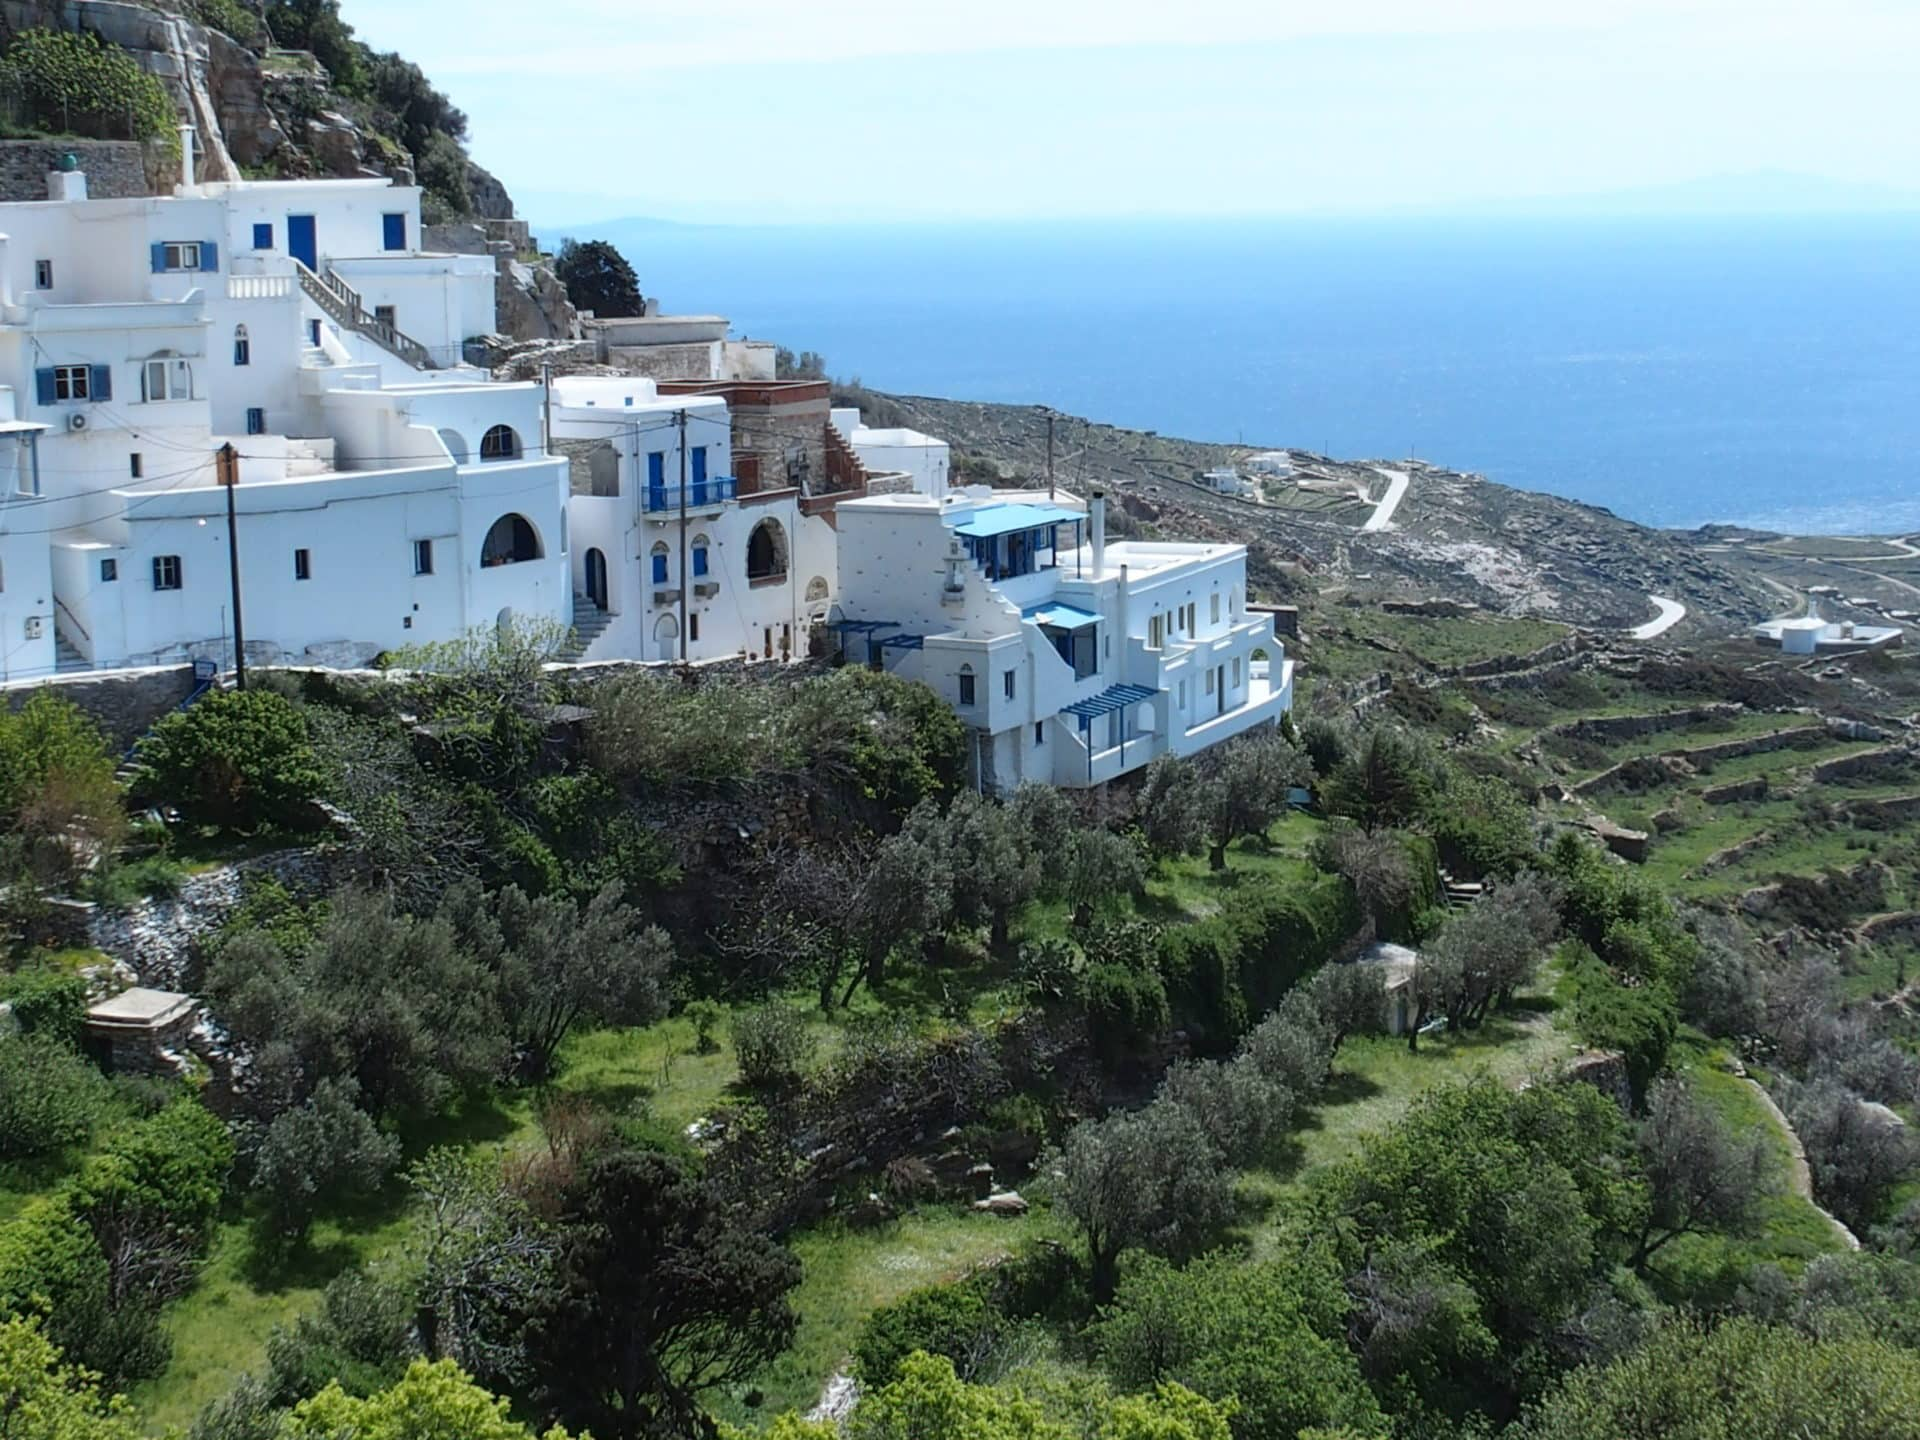 Tinos island Mediterranean gastronomy tour, Aegean Sea